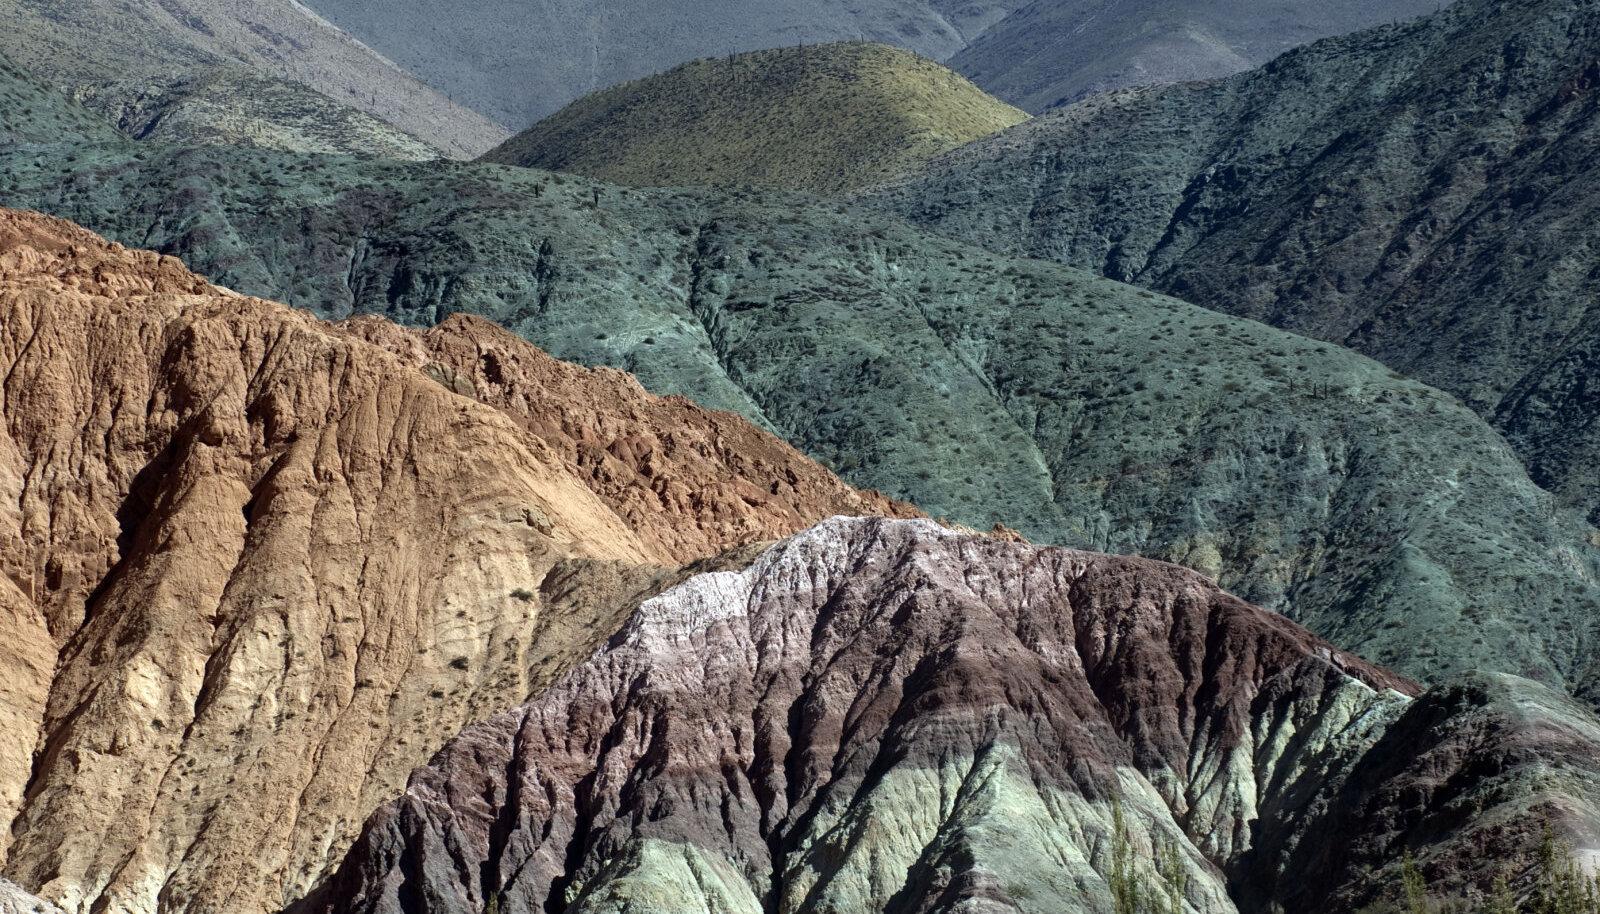 Argentina Cerro de Siete Colores (seitsme värvi mägi)